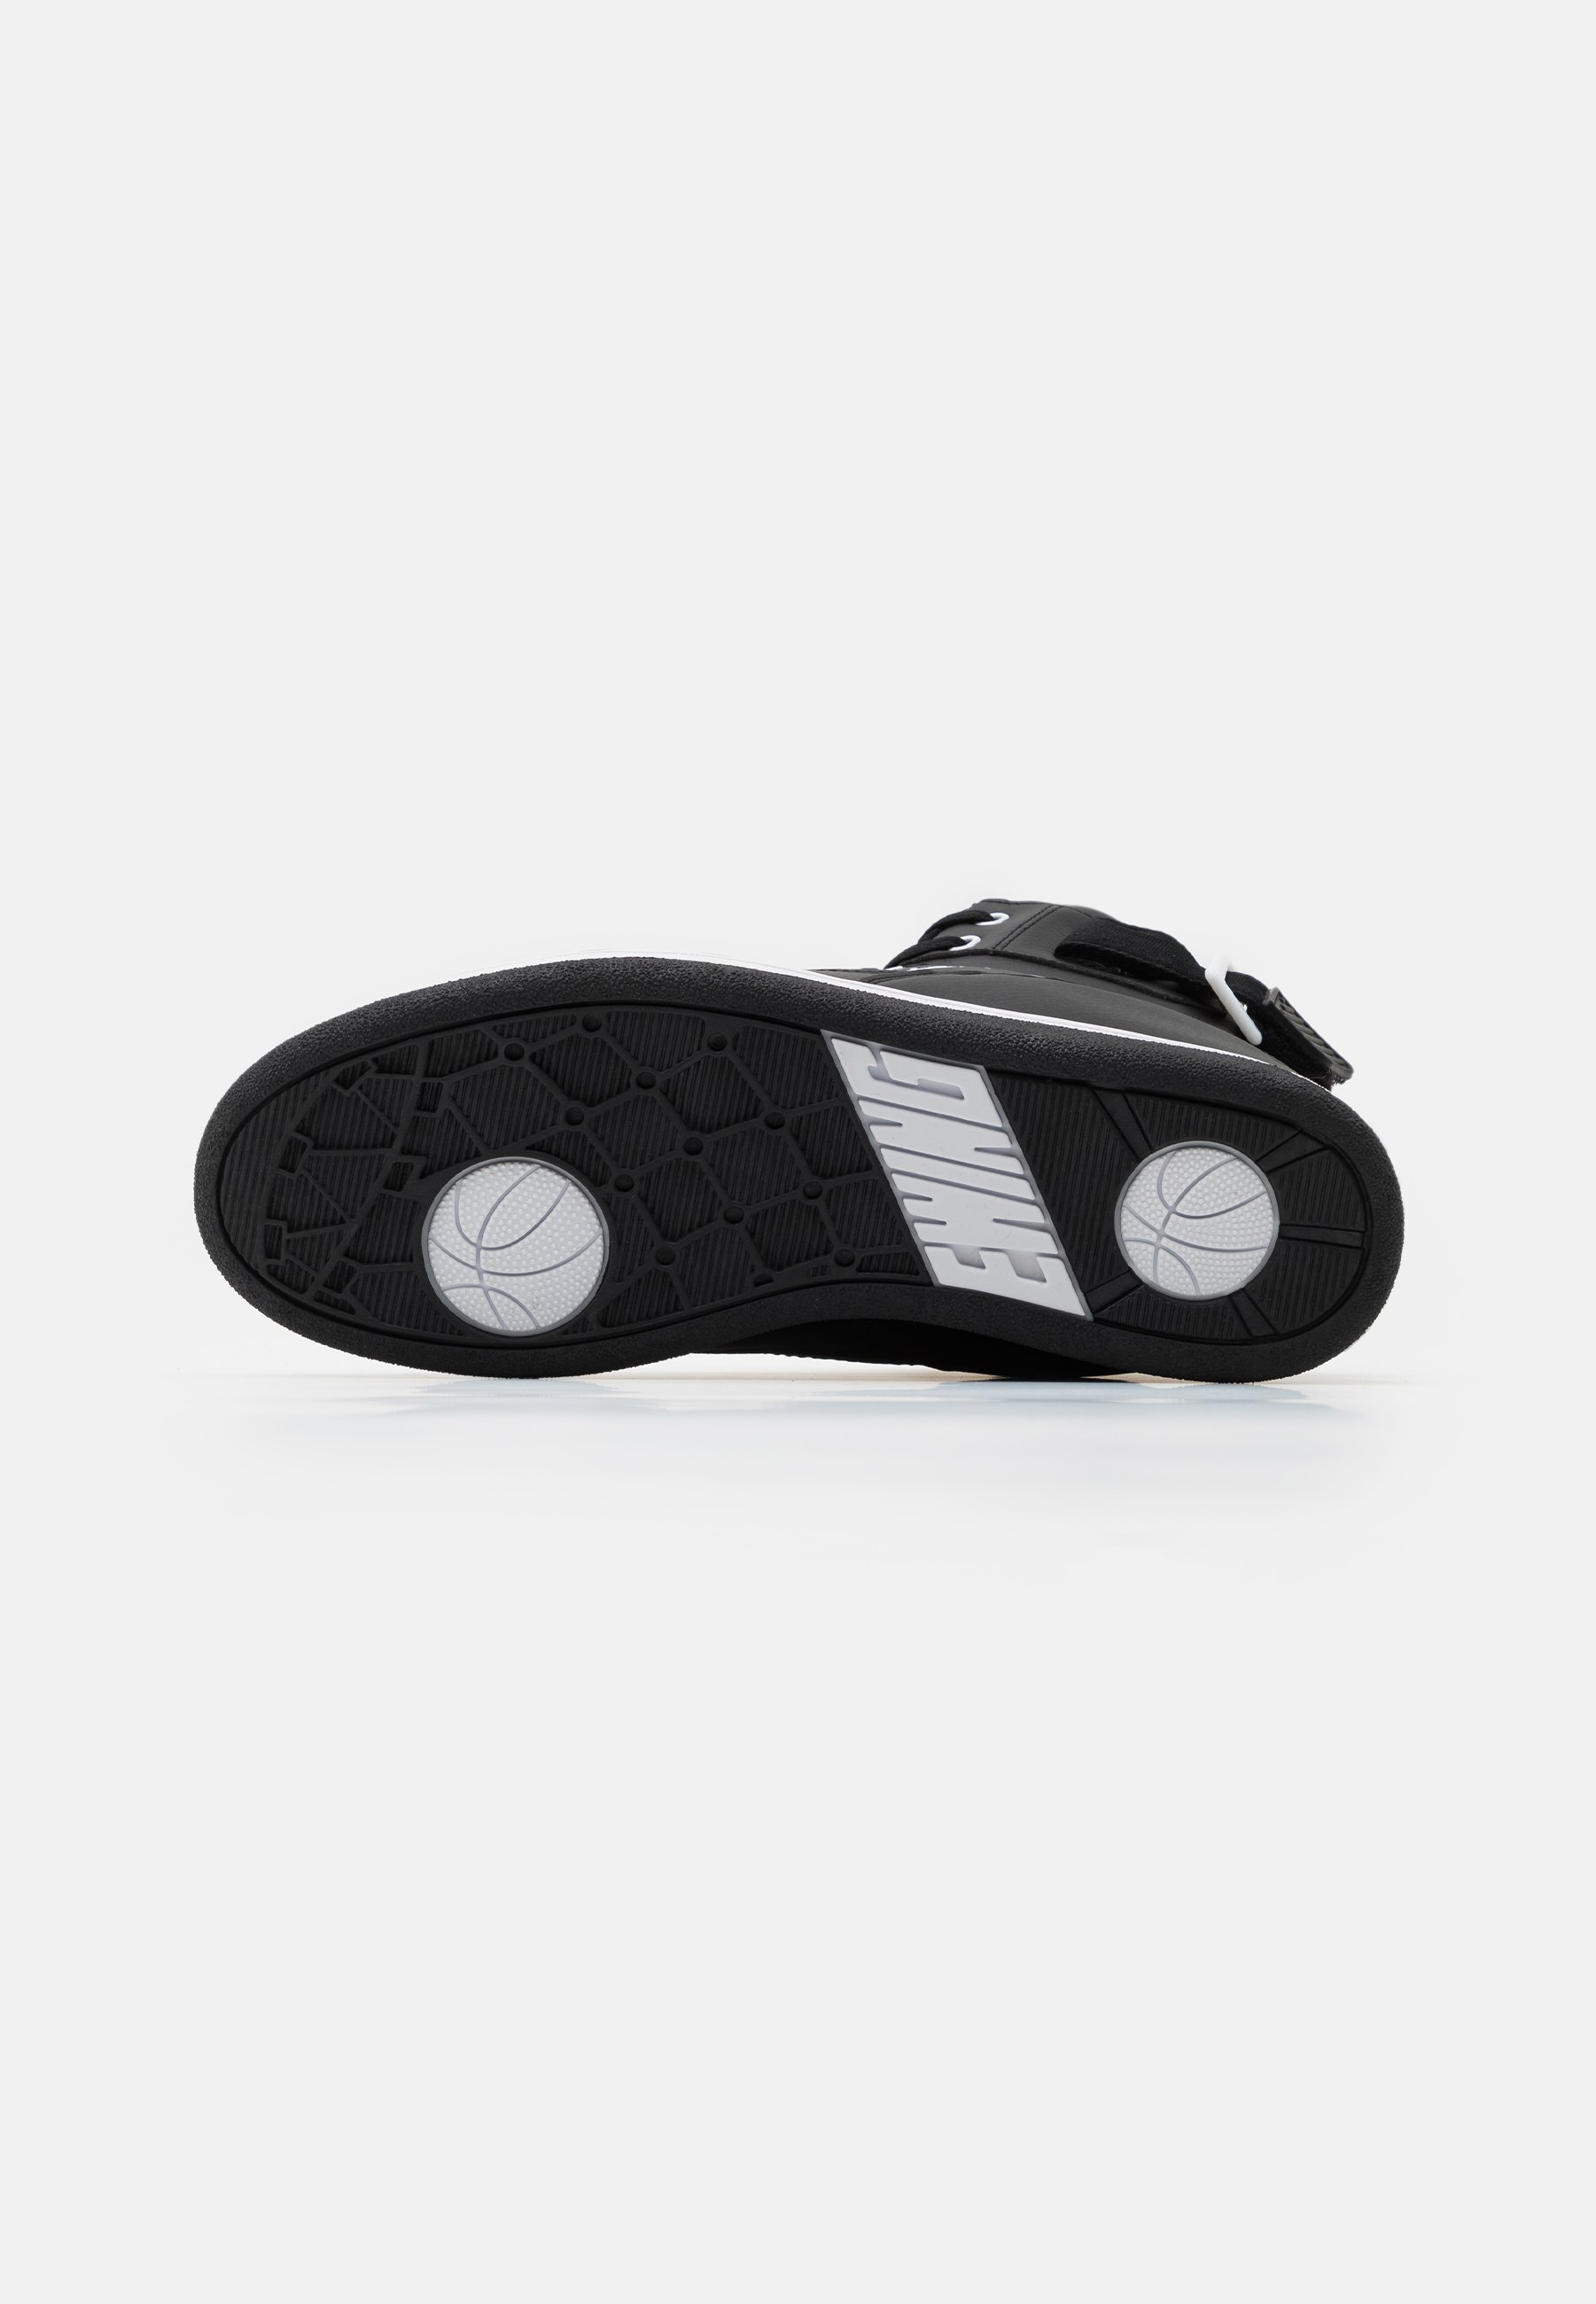 Ewing 33 HI - Sneaker high - black/white/schwarz - Herrenschuhe IOqkR